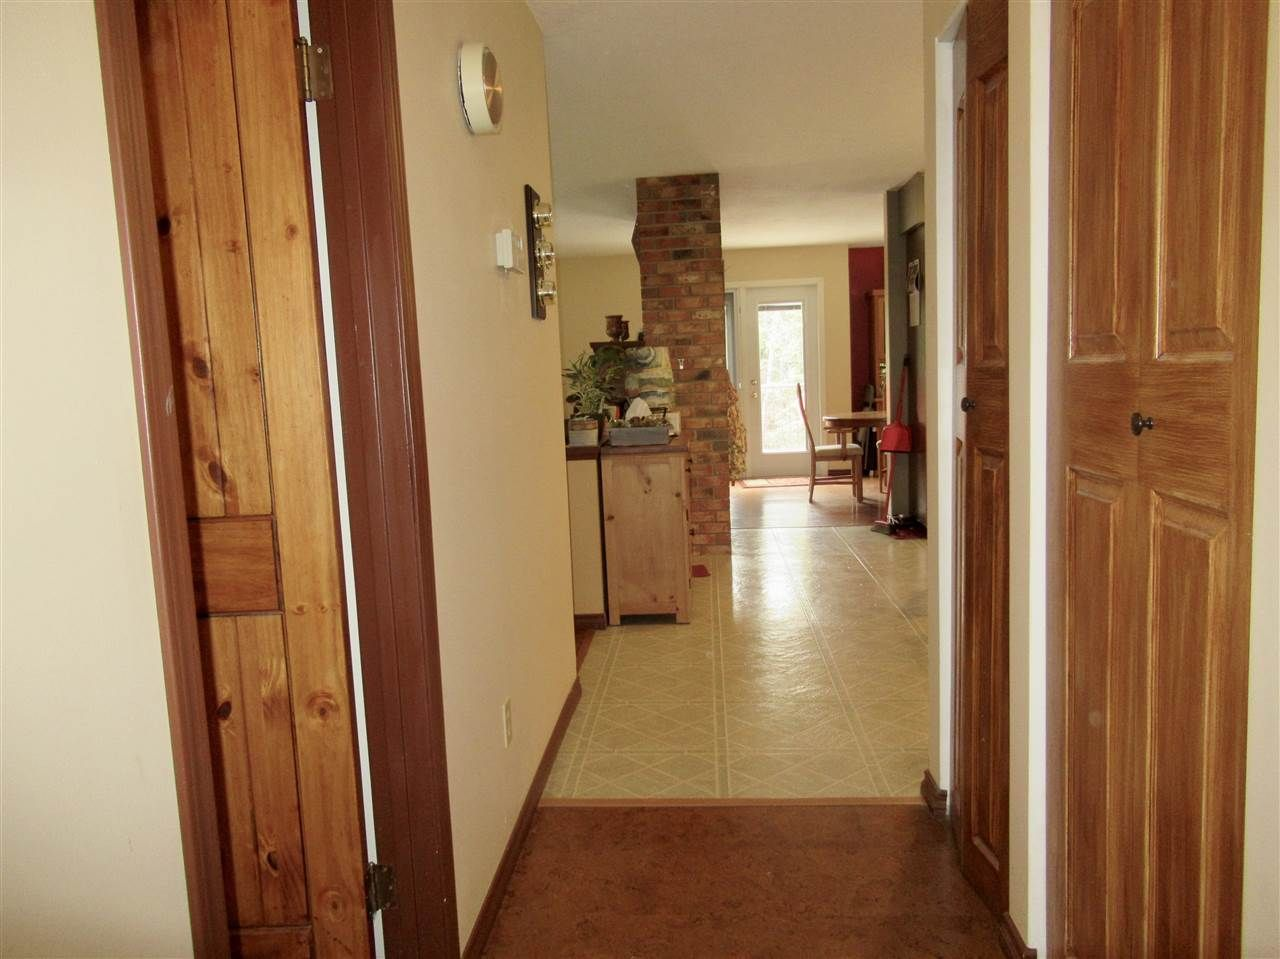 Photo 8: Photos: 911 CENTAUR Drive in Williams Lake: Esler/Dog Creek House for sale (Williams Lake (Zone 27))  : MLS®# R2378444